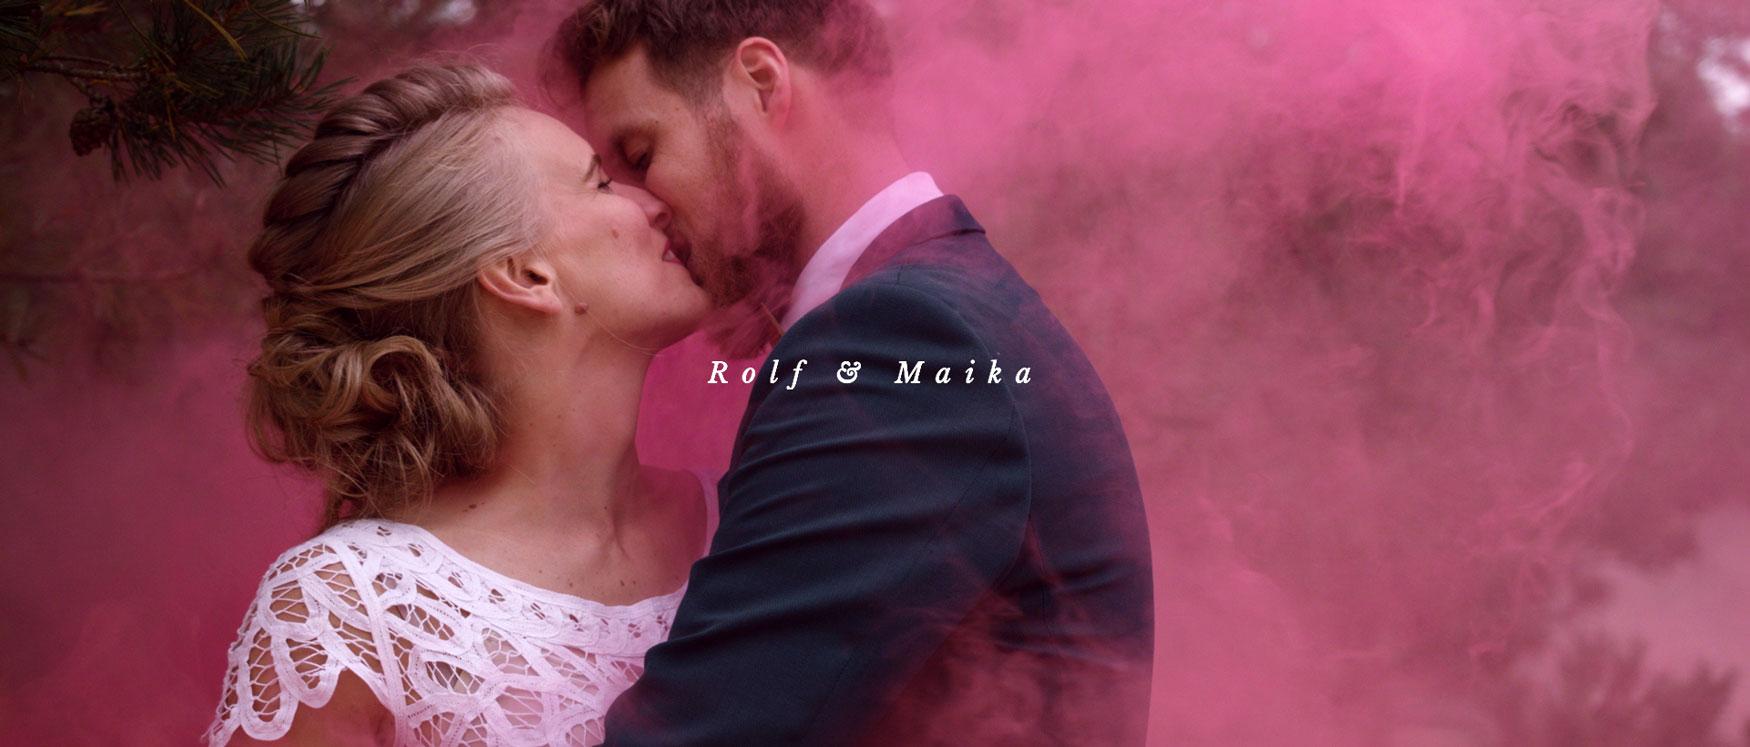 trouwfilm-videograaf-dreamers-amsterdam-trouwvideo-wedding-film-video-videographer-rolf-maika-web-1750